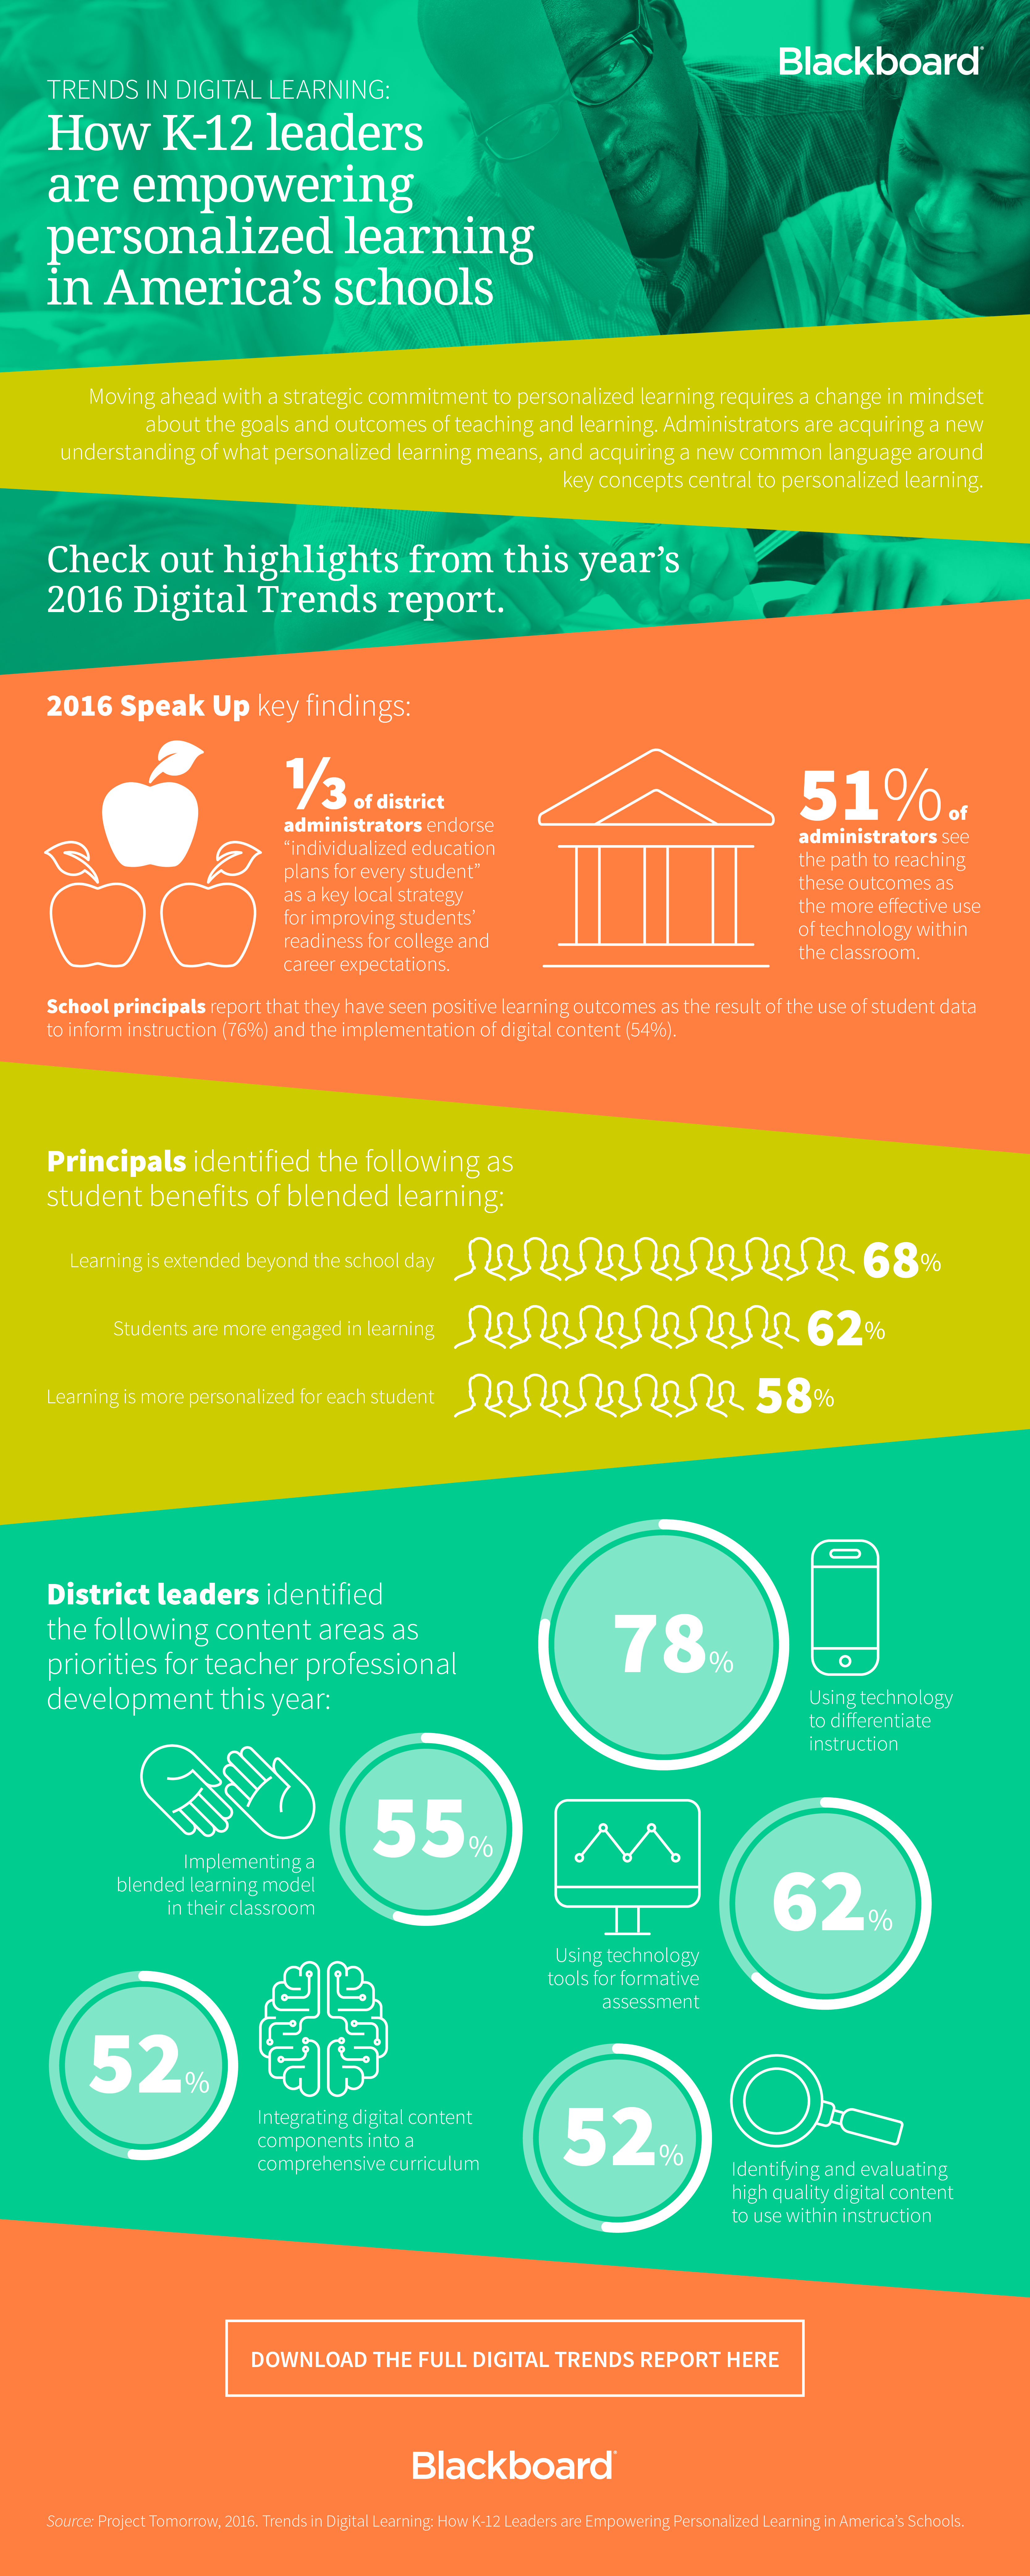 Digital Trends Report Infographic